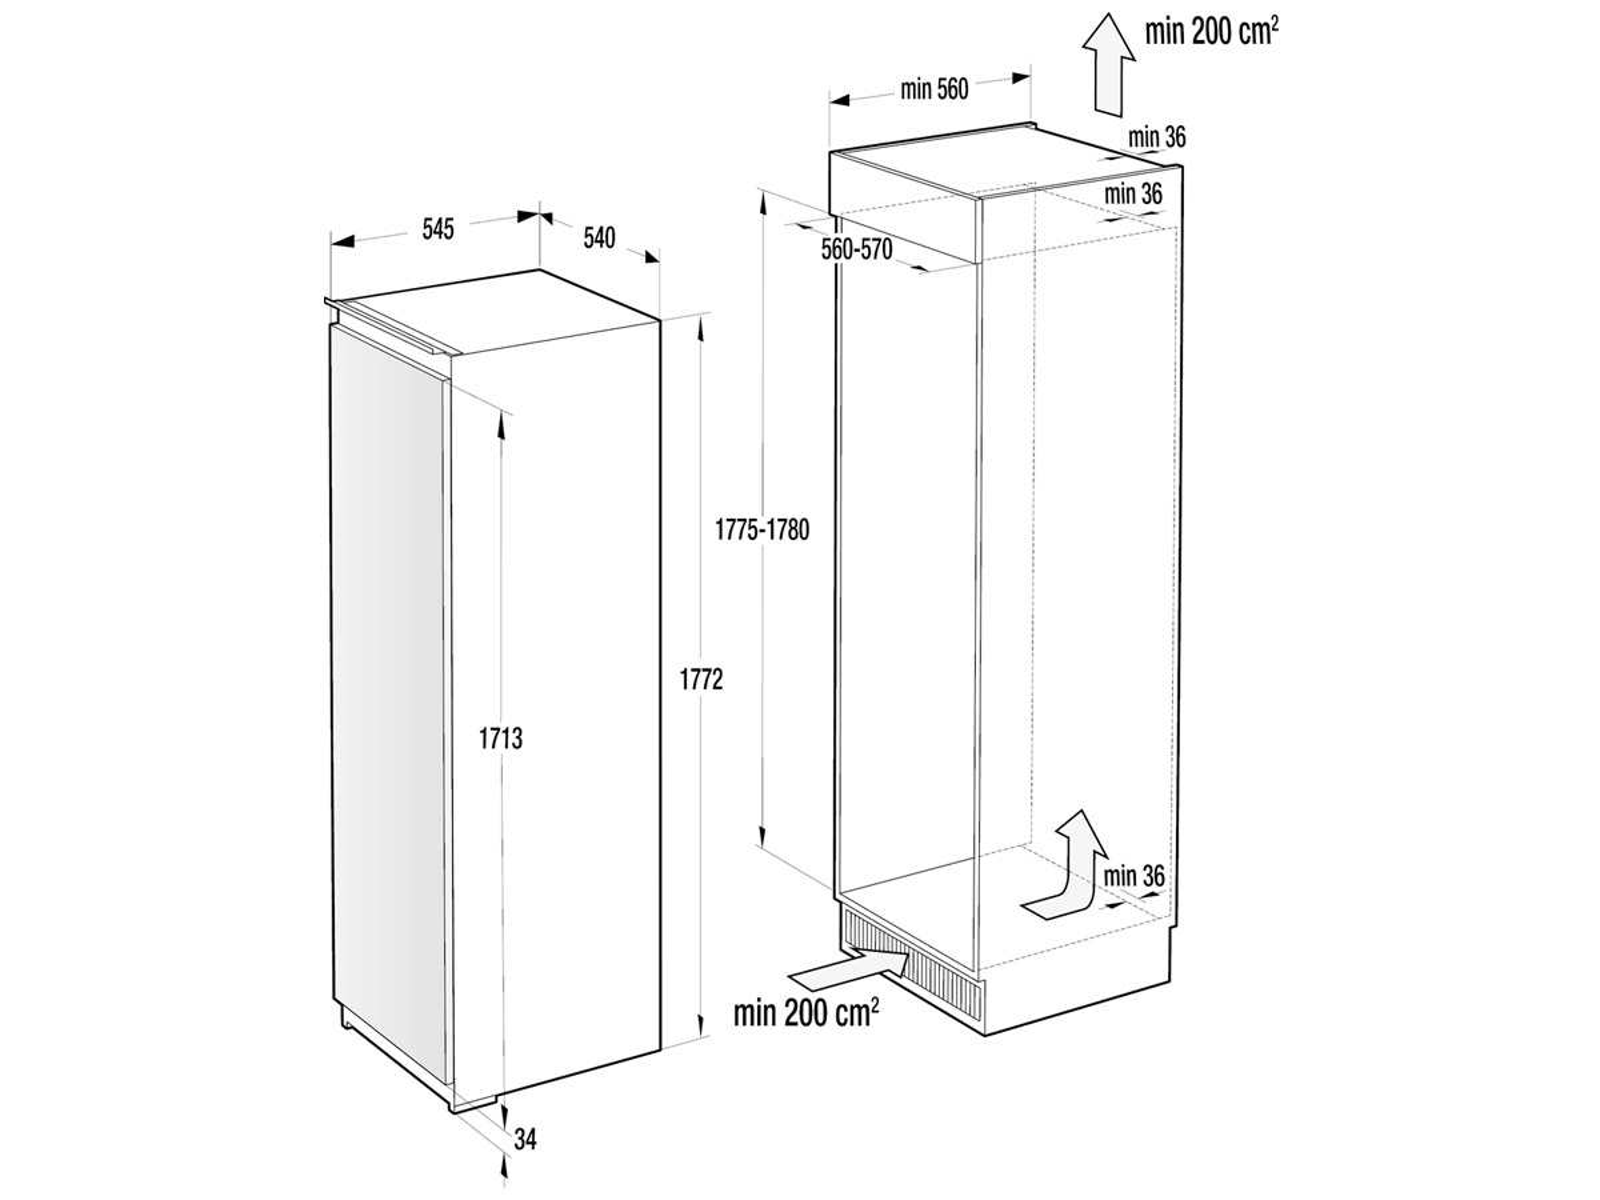 gorenje ri 4182 e1 einbauk hlschrank ebay. Black Bedroom Furniture Sets. Home Design Ideas